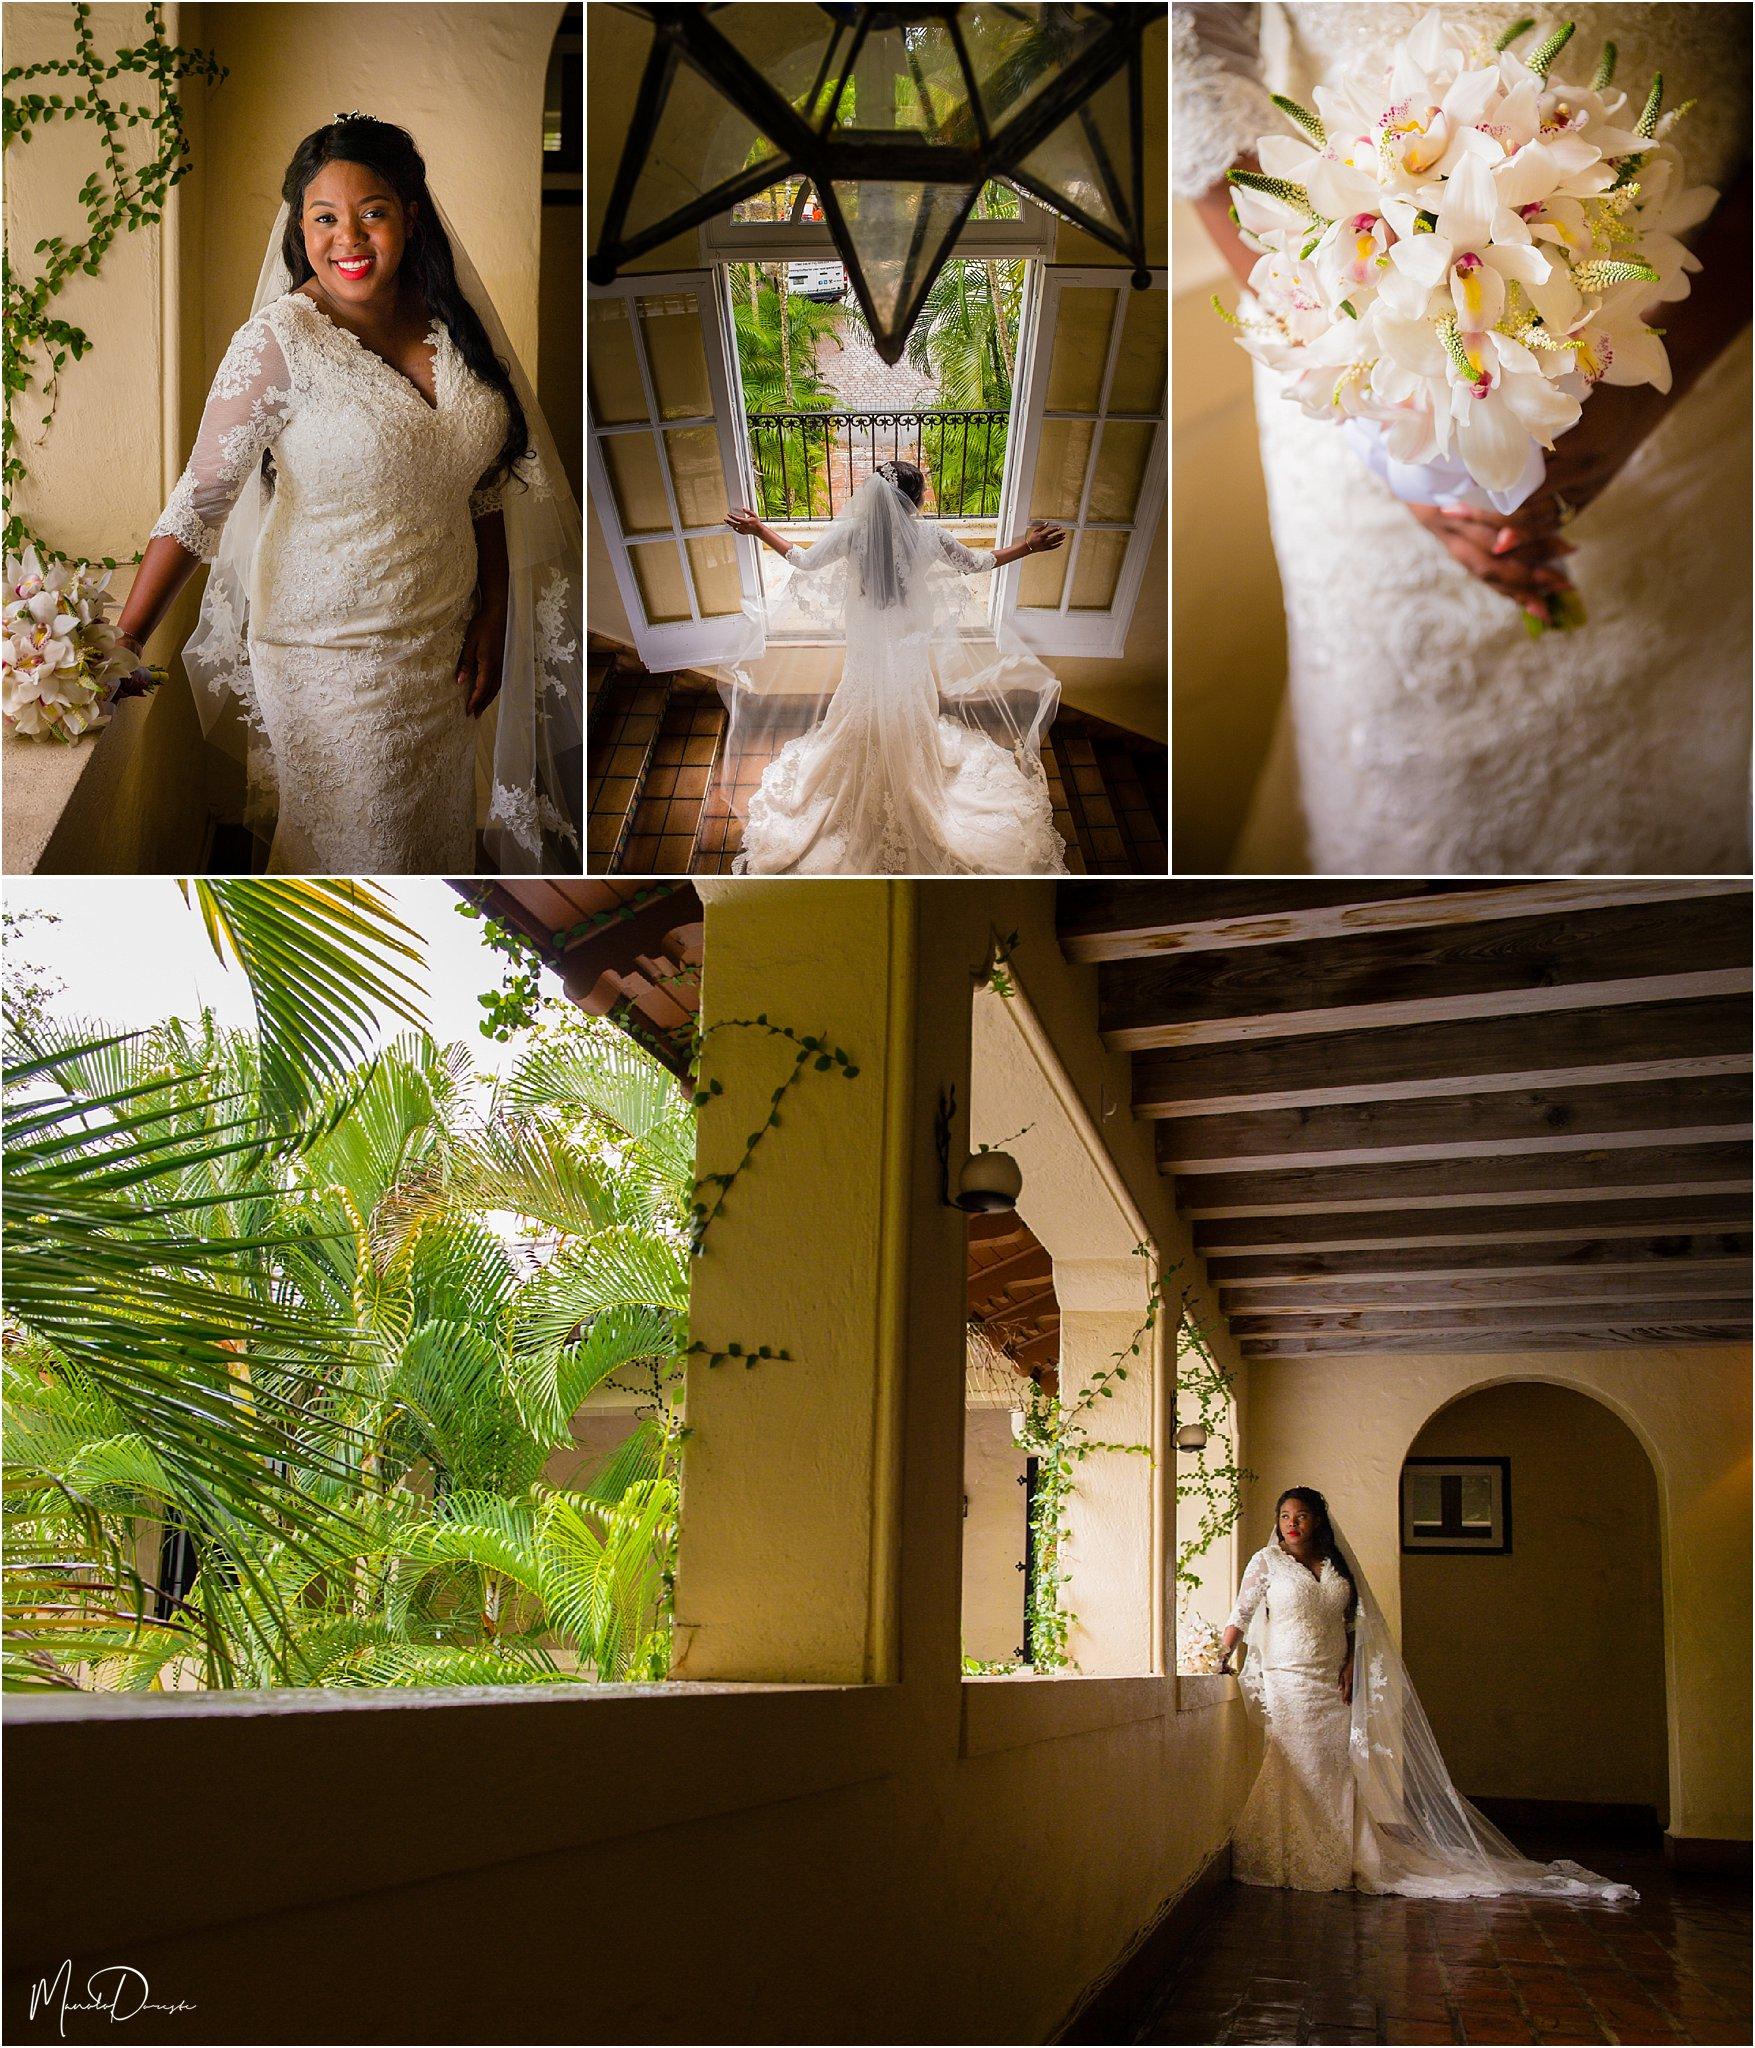 0418_ManoloDoreste_InFocusStudios_Wedding_Family_Photography_Miami_MiamiPhotographer.jpg